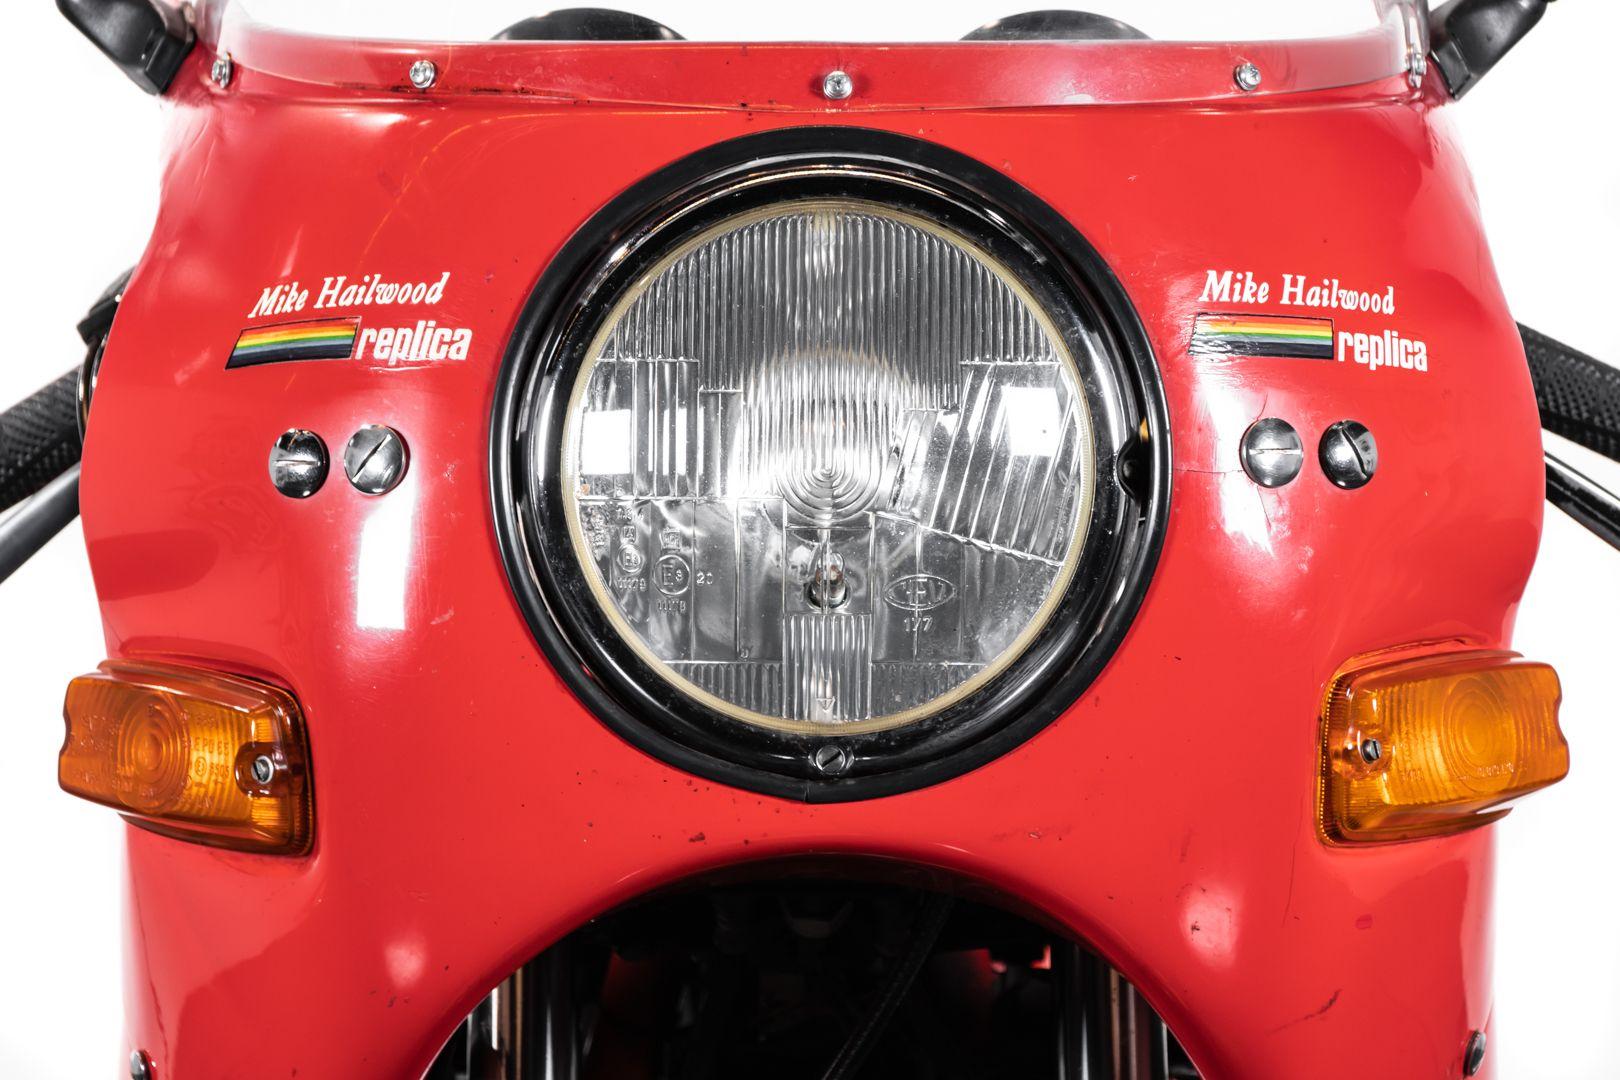 1983 Ducati 900 Mike Hailwood Replica 71421